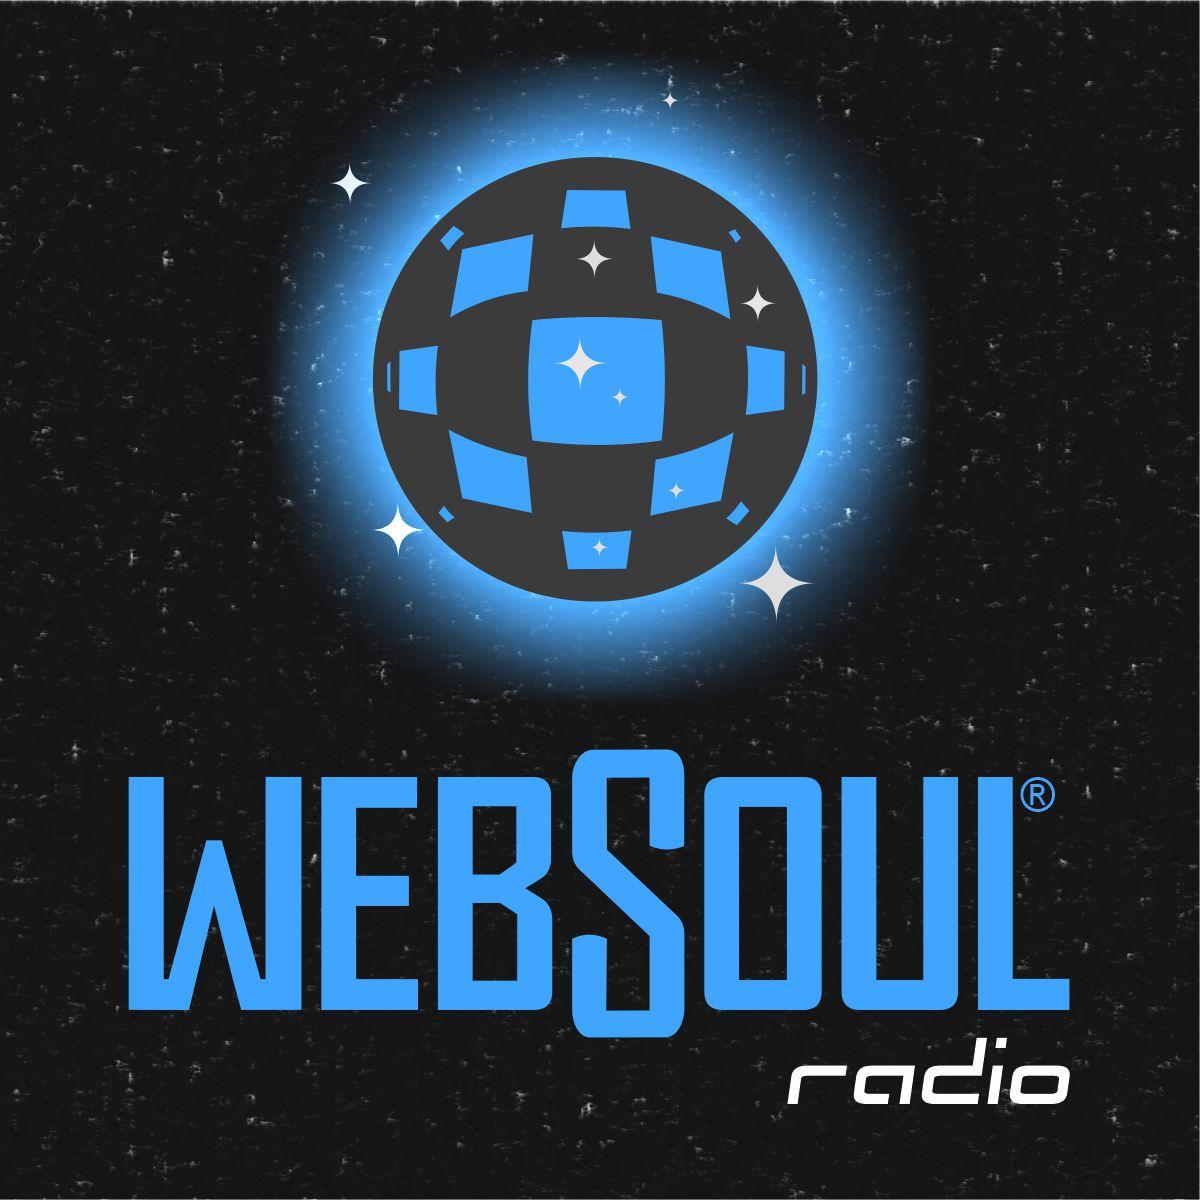 WEBSOUL radio